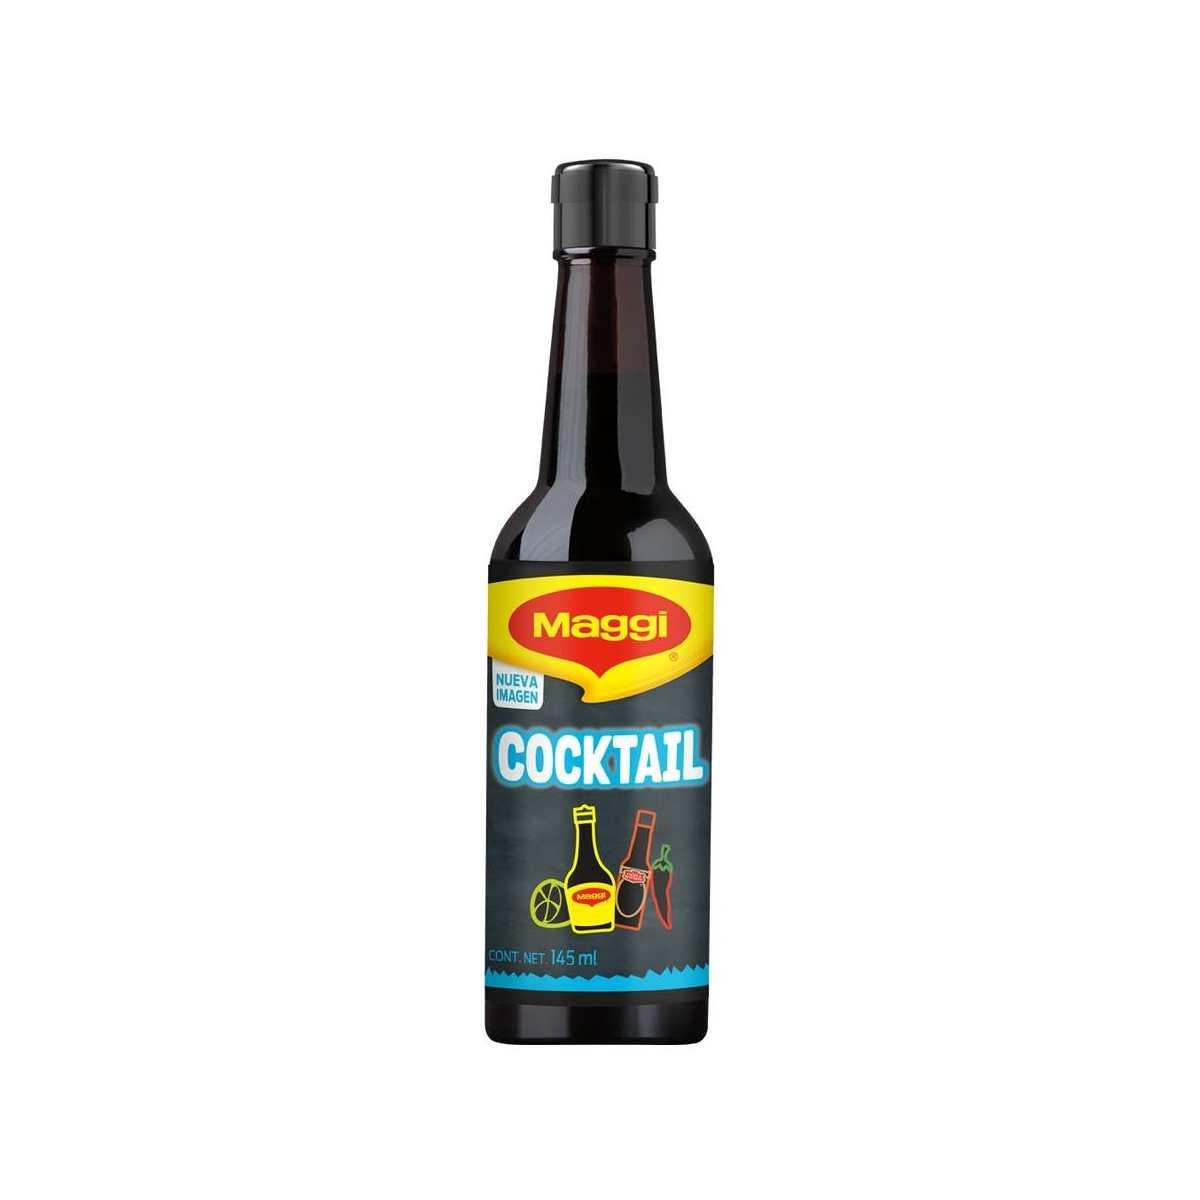 Maggi Cocktail